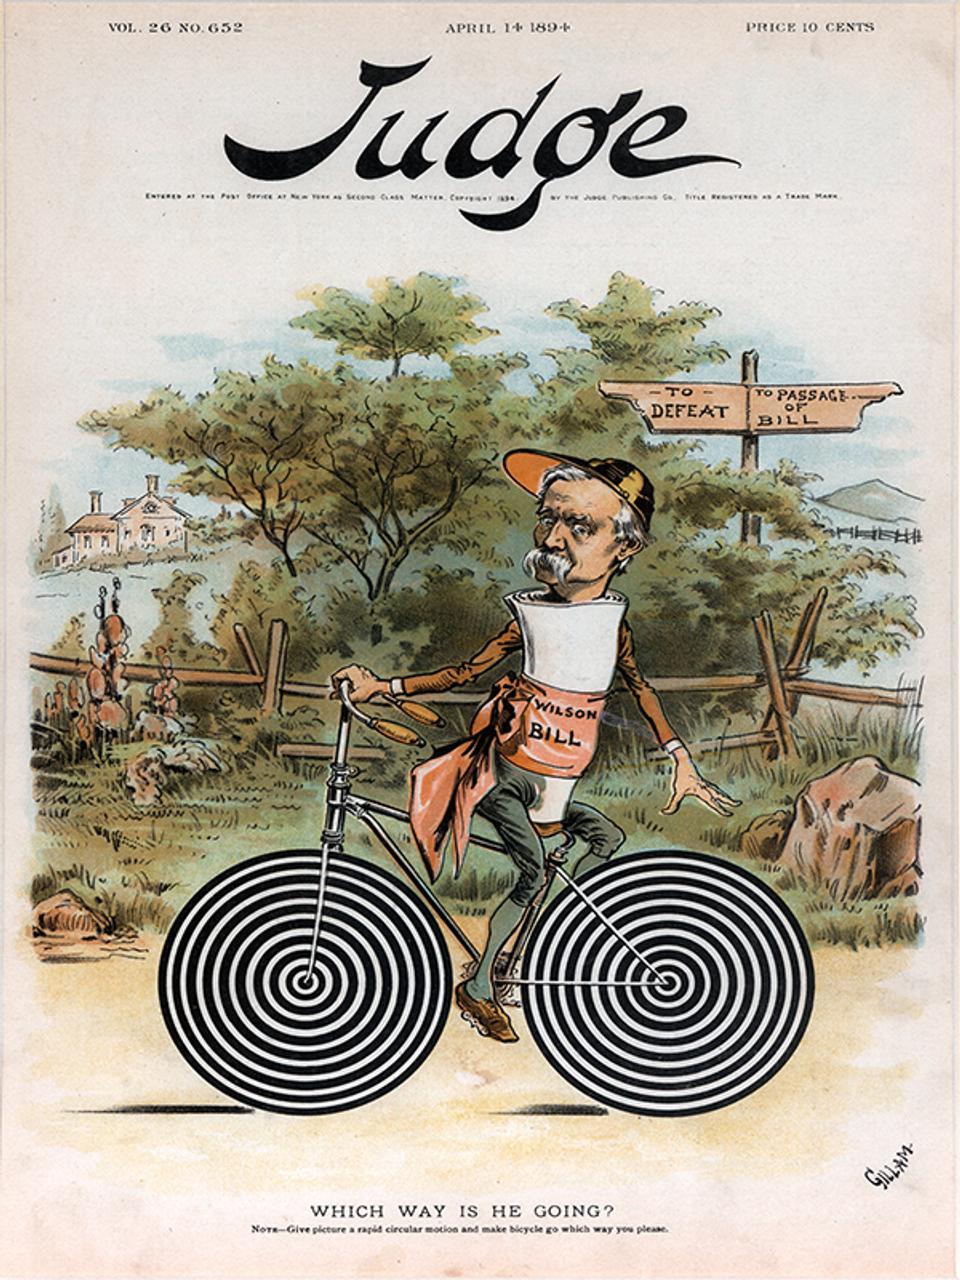 Judge Magazine April 14, 1894 Bicycle Poster